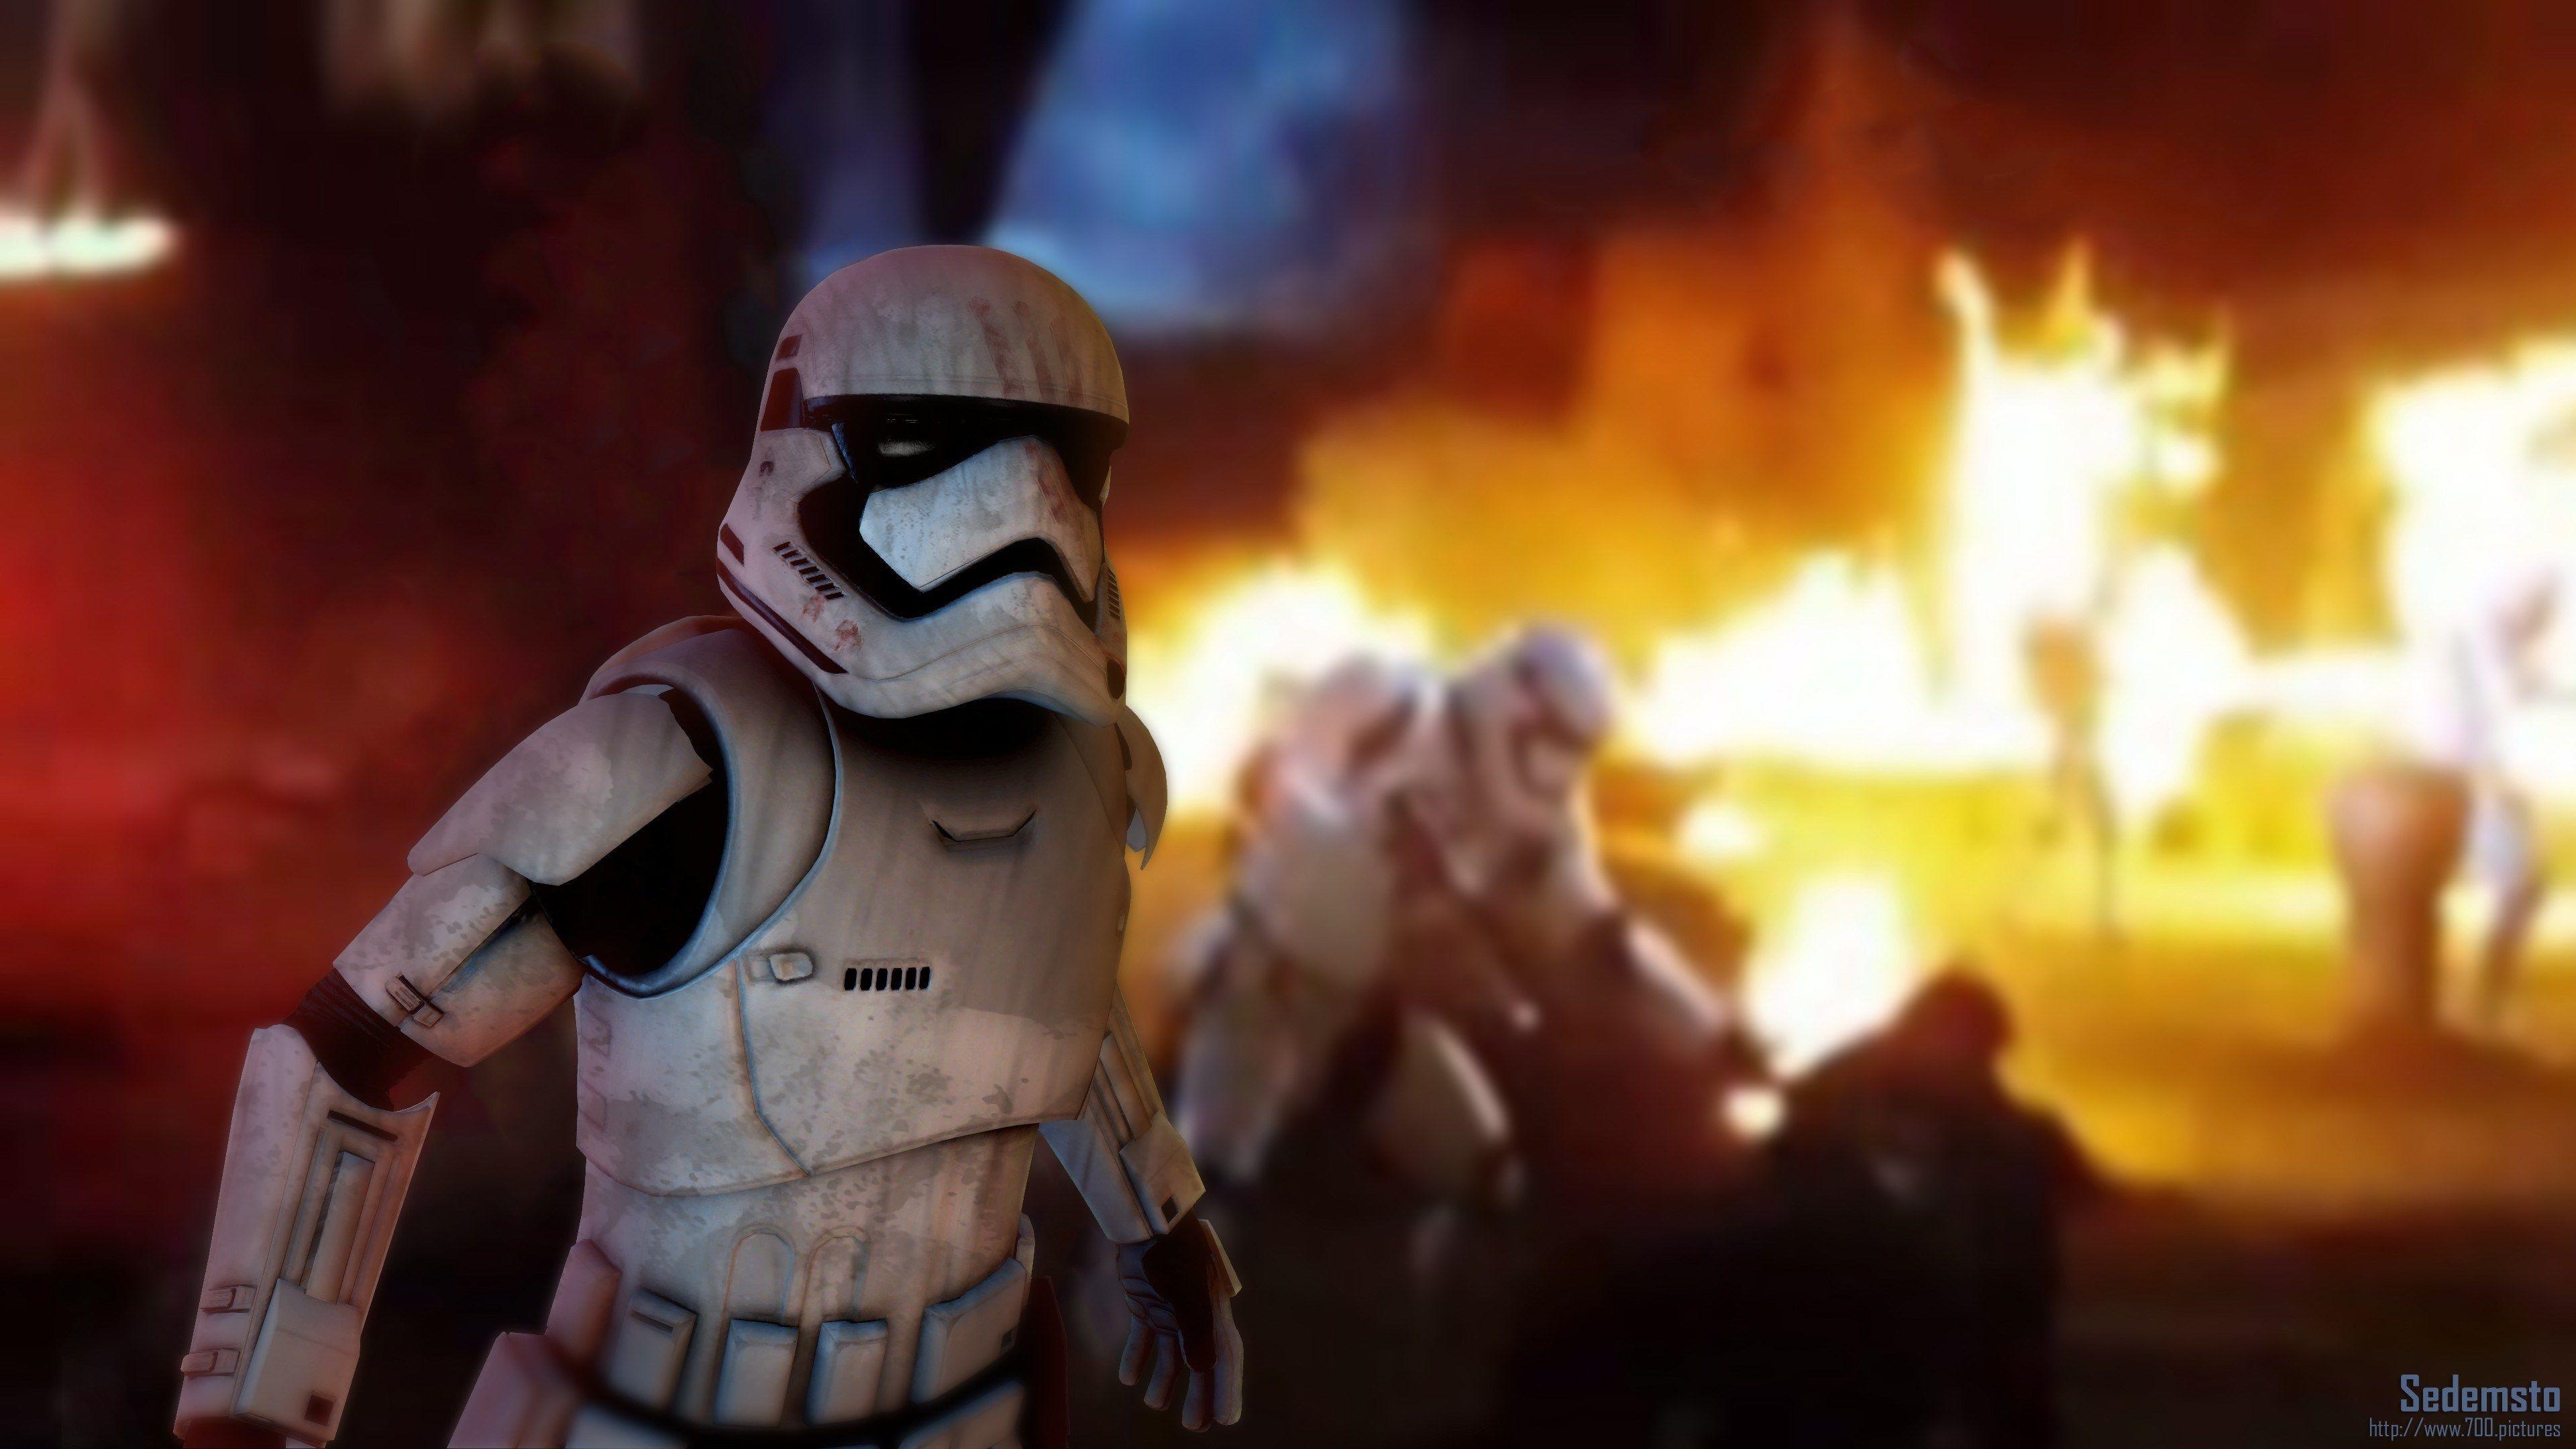 3840x2160 Stormtrooper 4k Amazing Hd Wallpaper Star Wars Wallpaper Star Wars Star Wars Movie